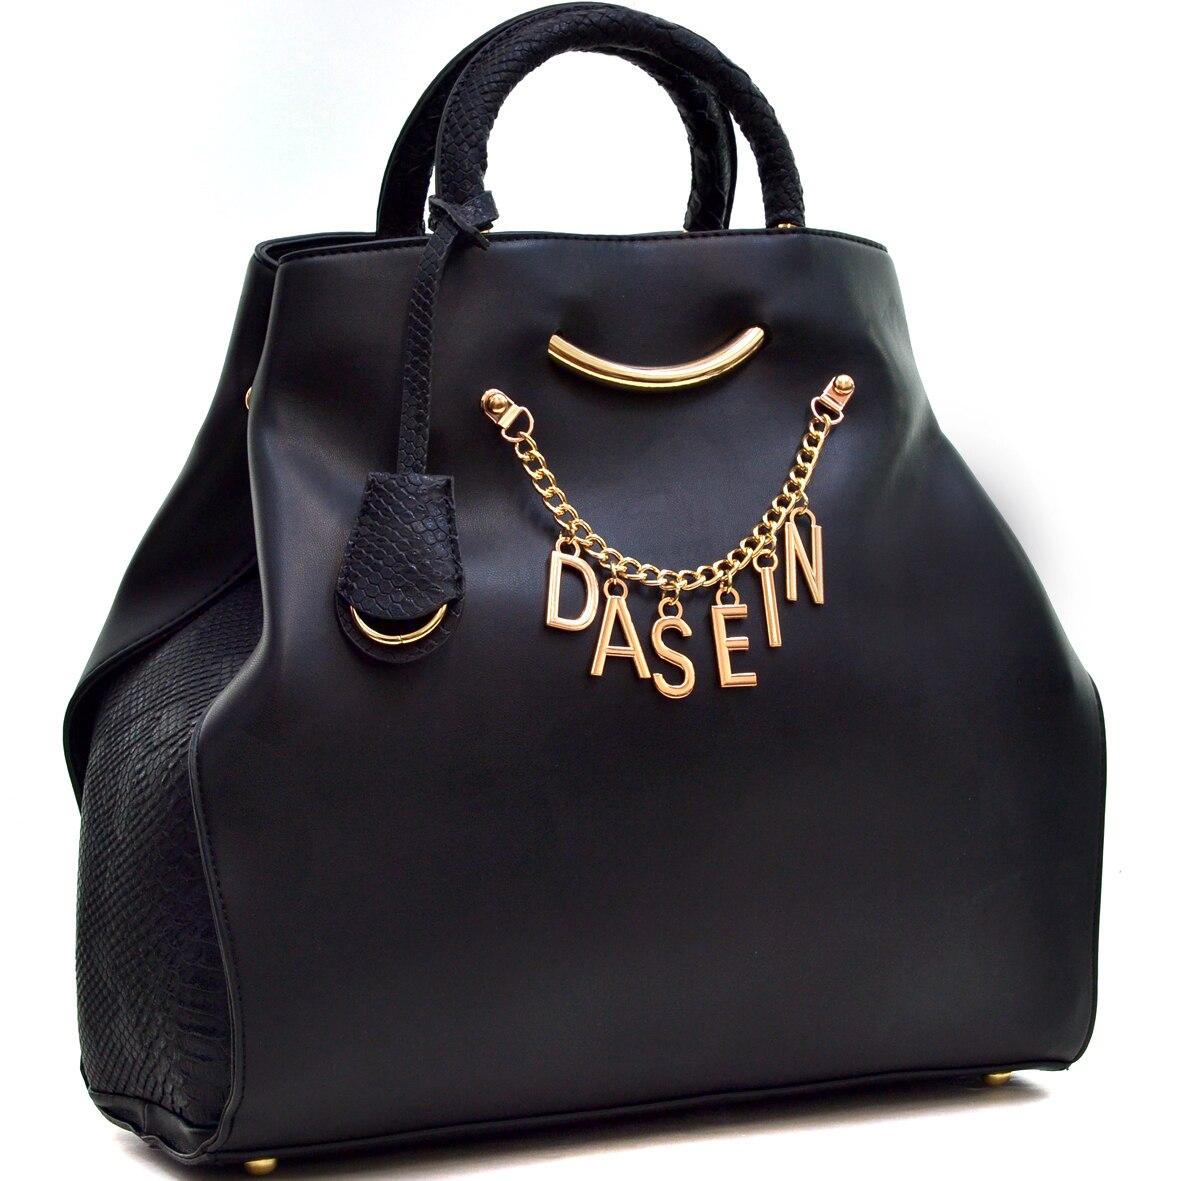 Dasein Women's Designer Signature Top Zip Ring Tote Bag Satchel Handbag Purse with Embossed Trim pompom trim crop cami top with shorts